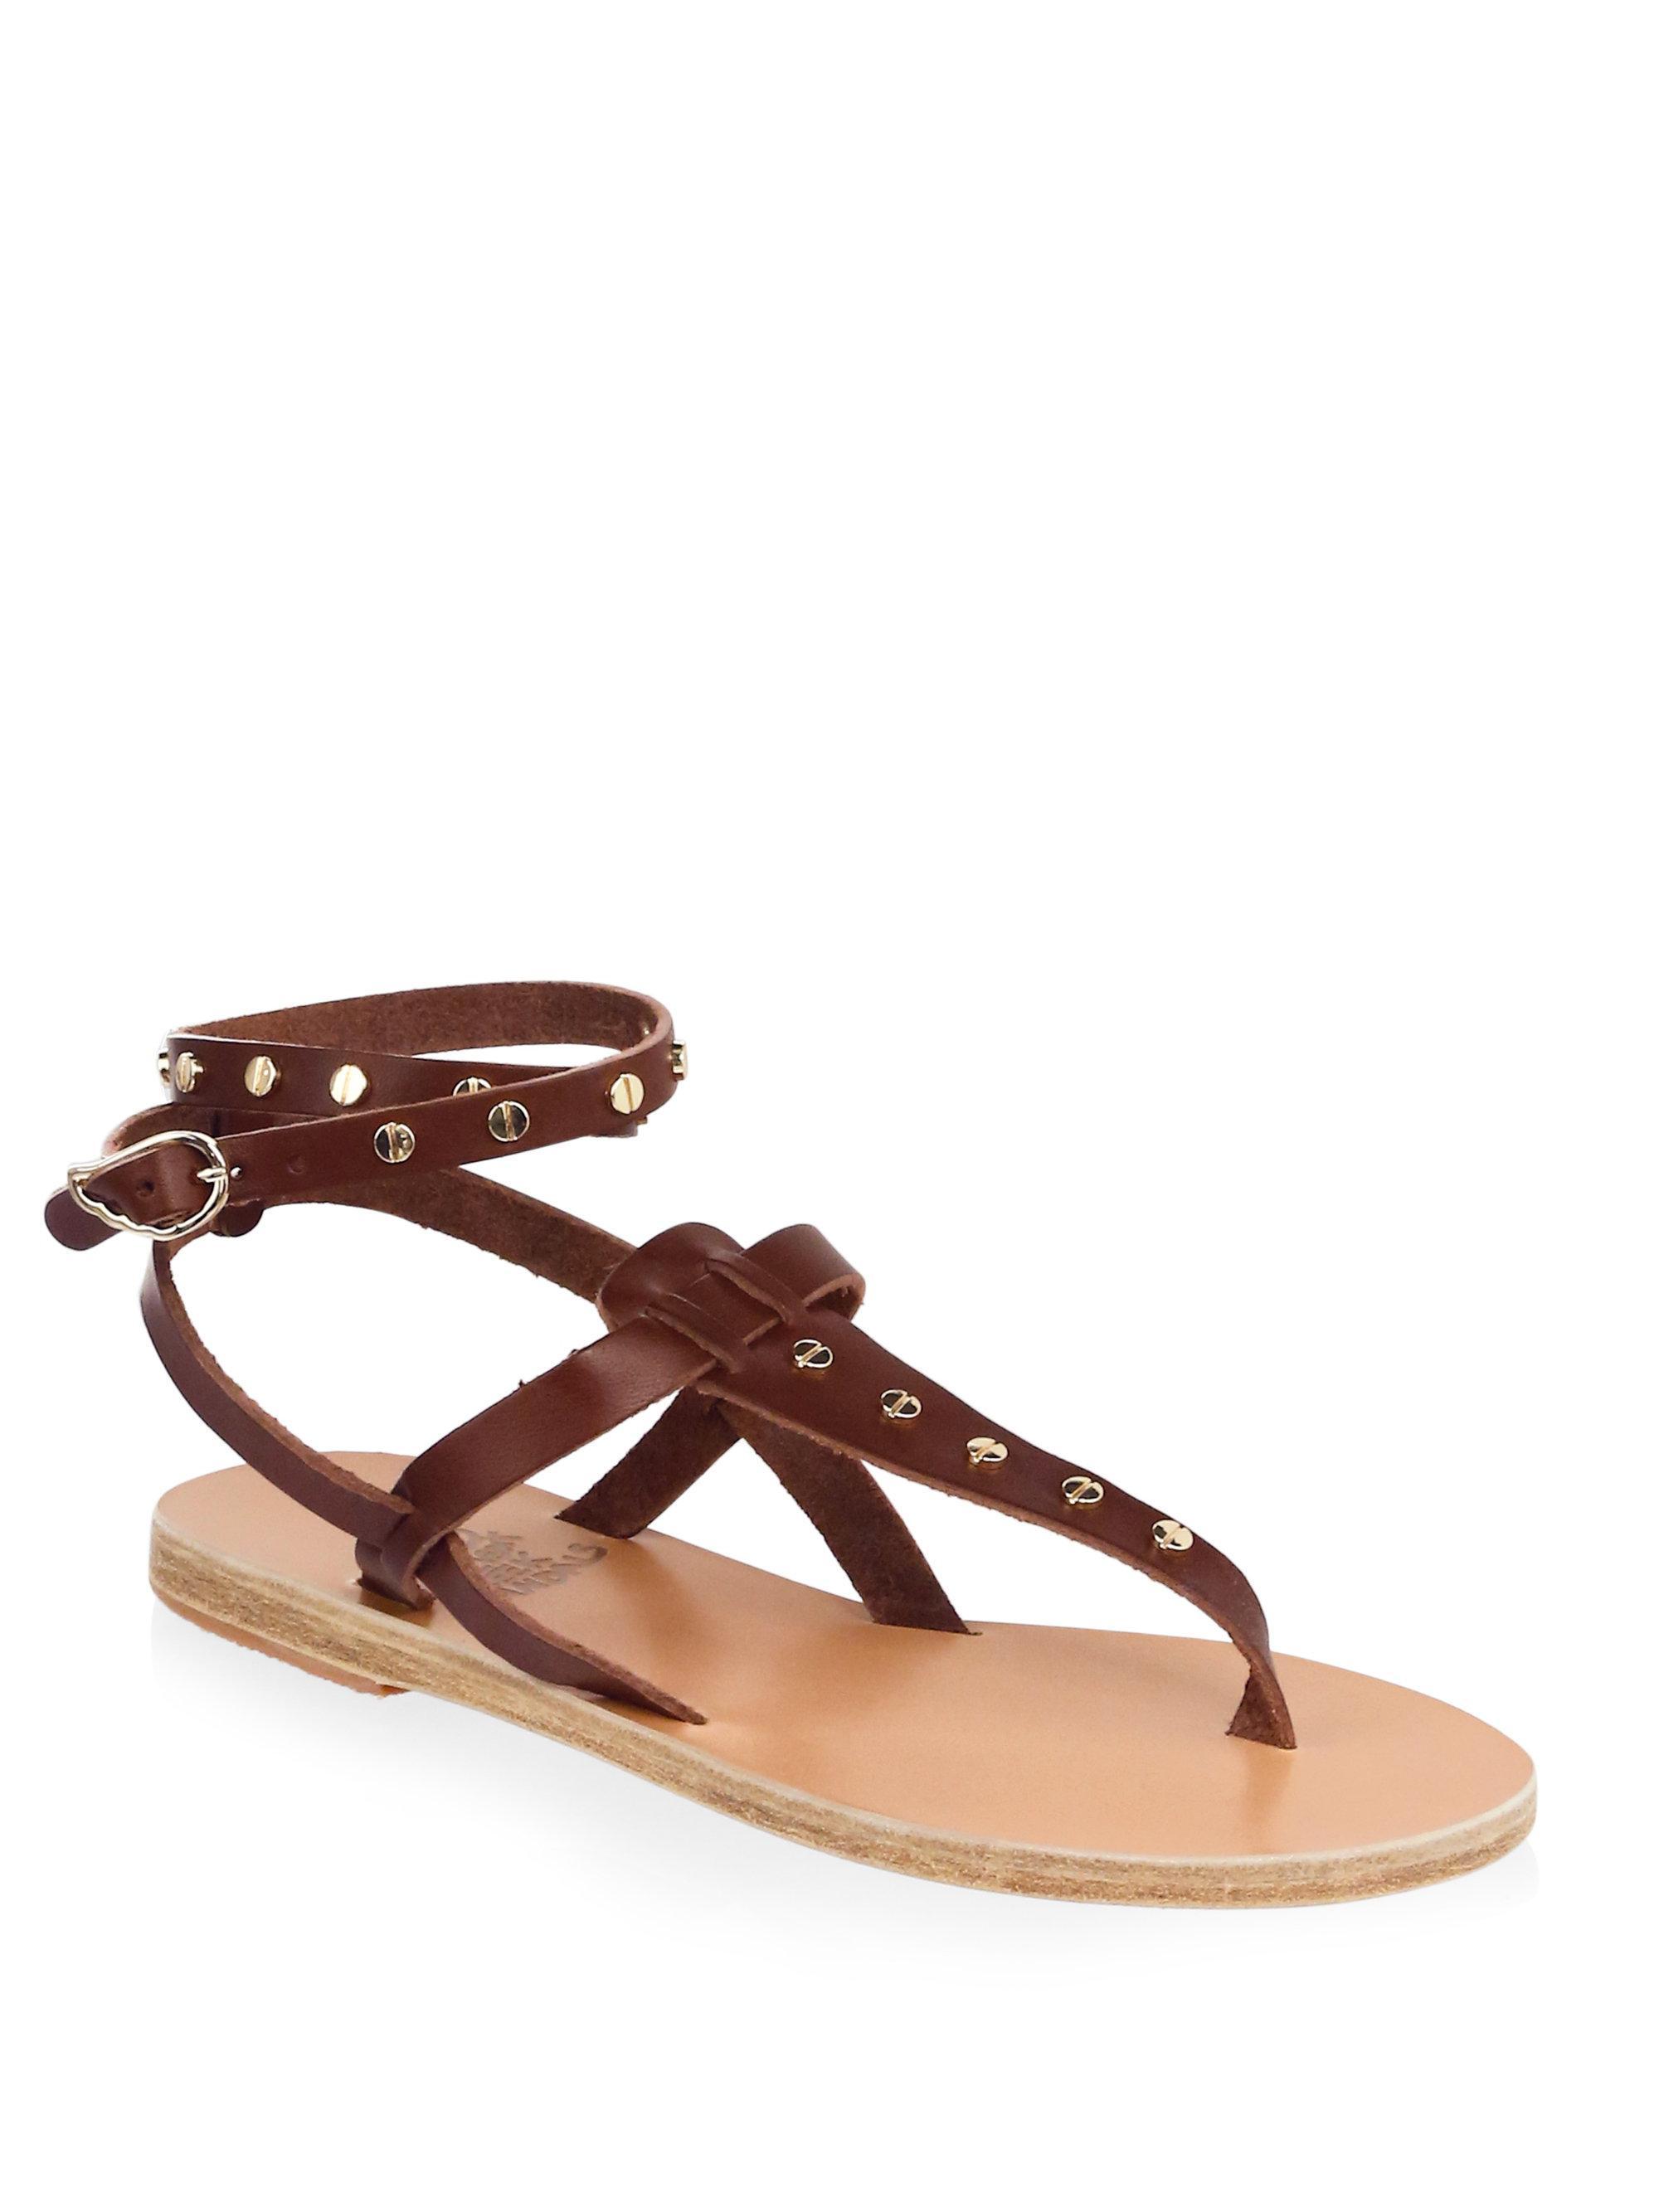 Ancient Greek Sandals Estia Nails Leather Sandals Il1nIh4